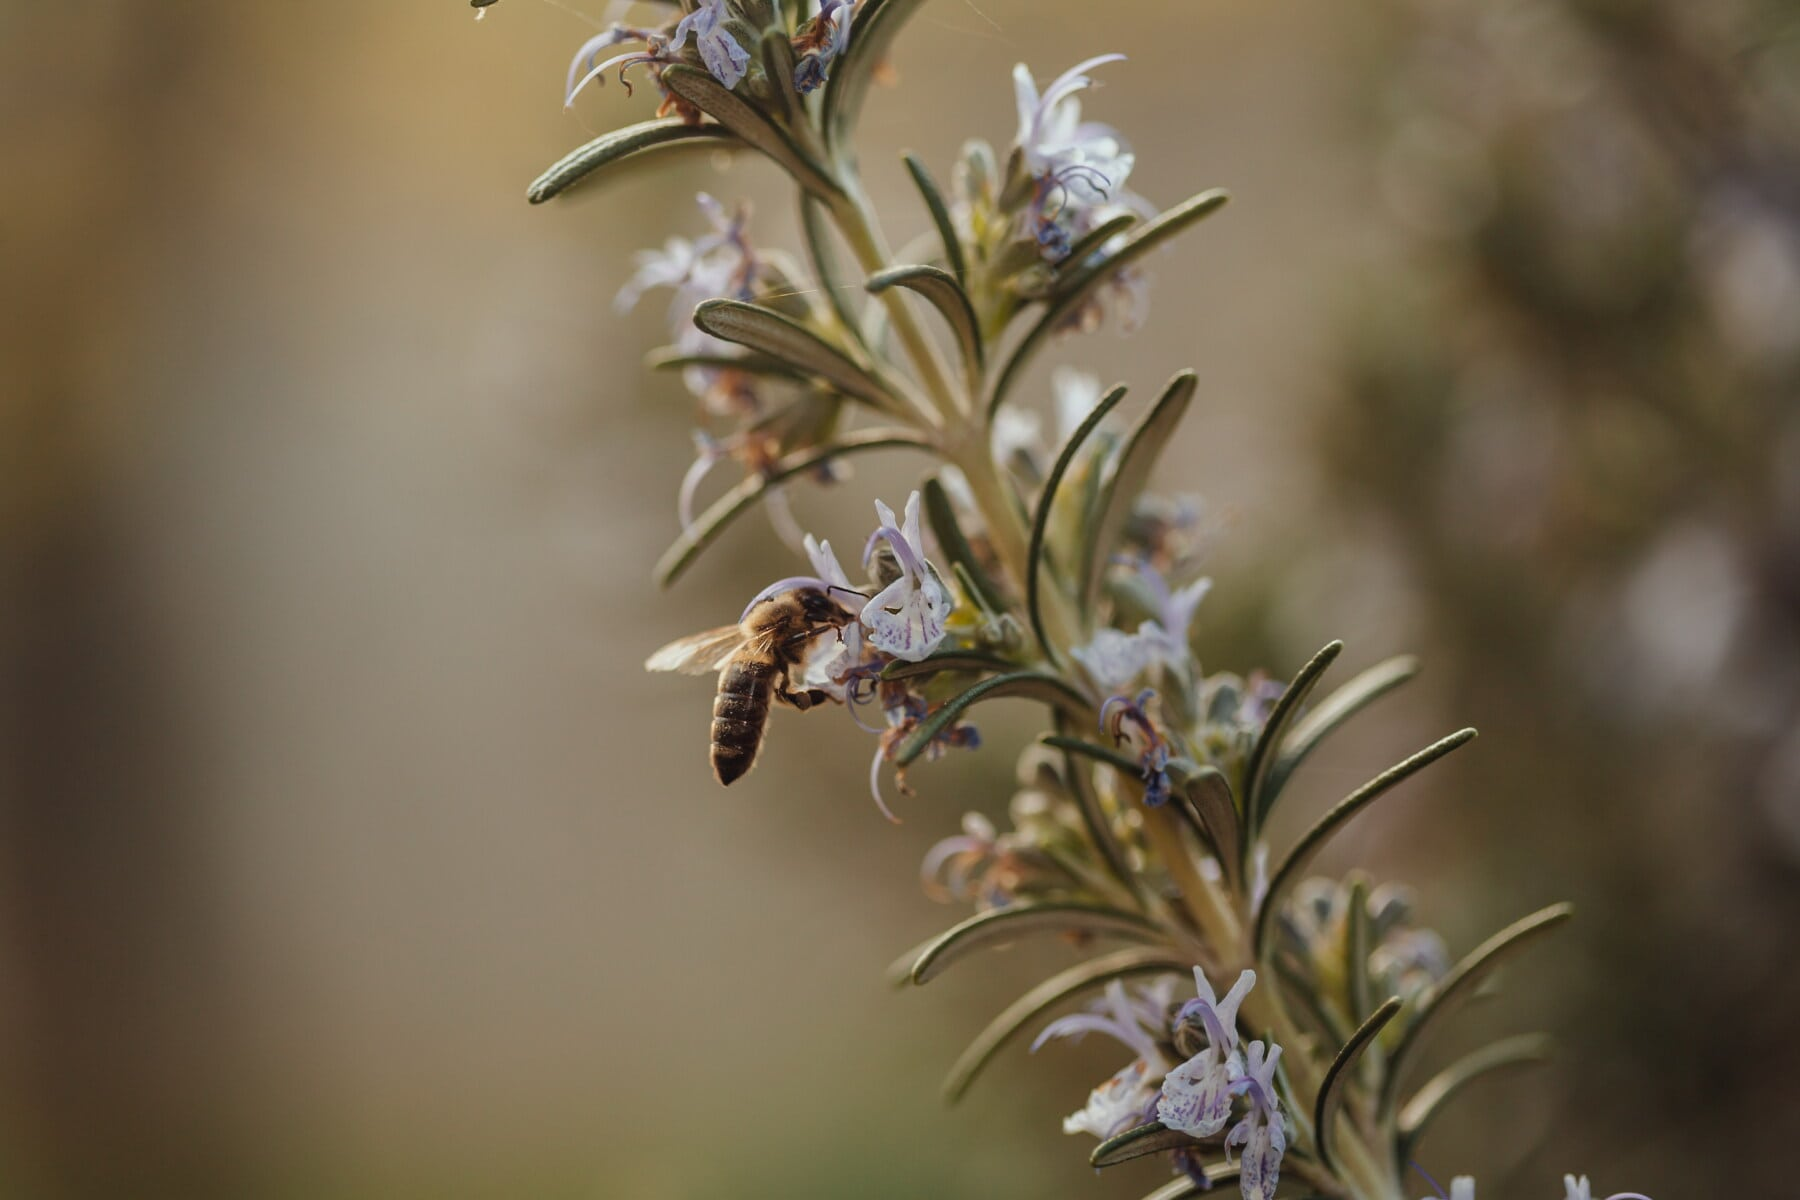 rosemary, wildflower, bee, honeybee, insect, nectar, pollen, herb, aromatic, nature